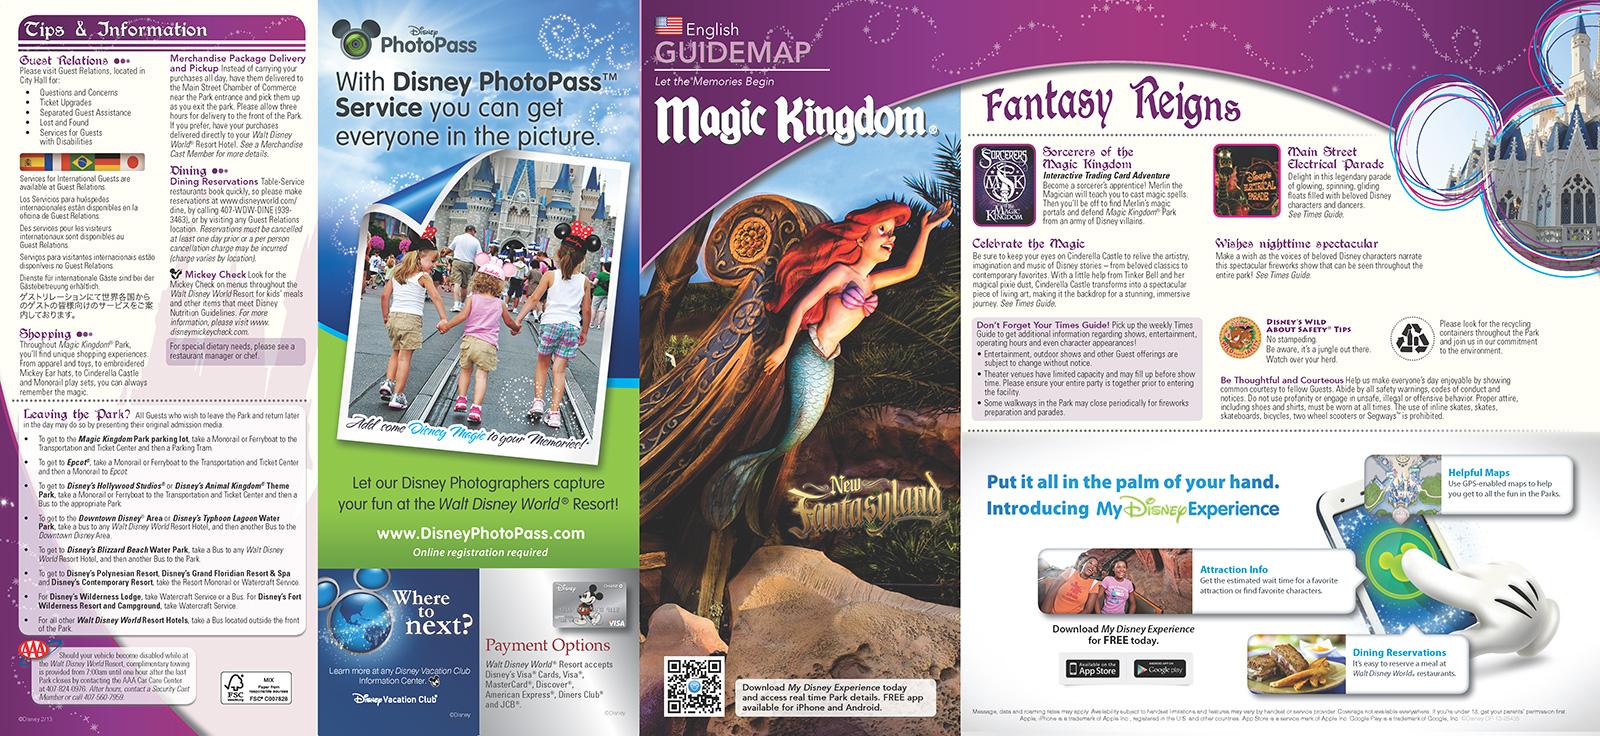 Walt Disney World Park and Resort Maps - New 2013 Magic Kingdom ...